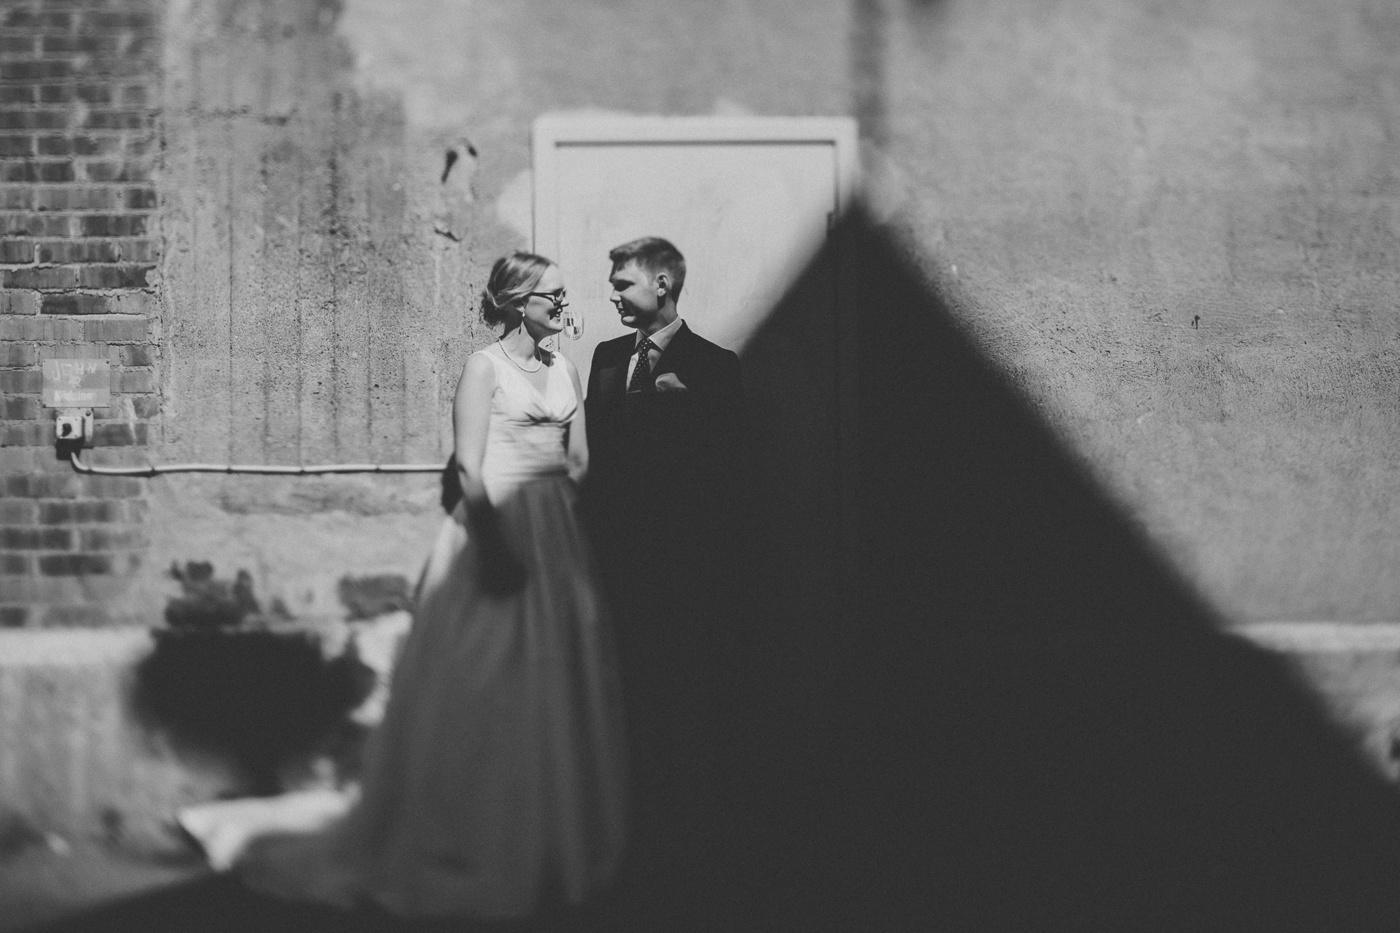 ceciliajoakim_sweden-countryside-summer-wedding_melbourne-fun-quirky-wedding-photography_42